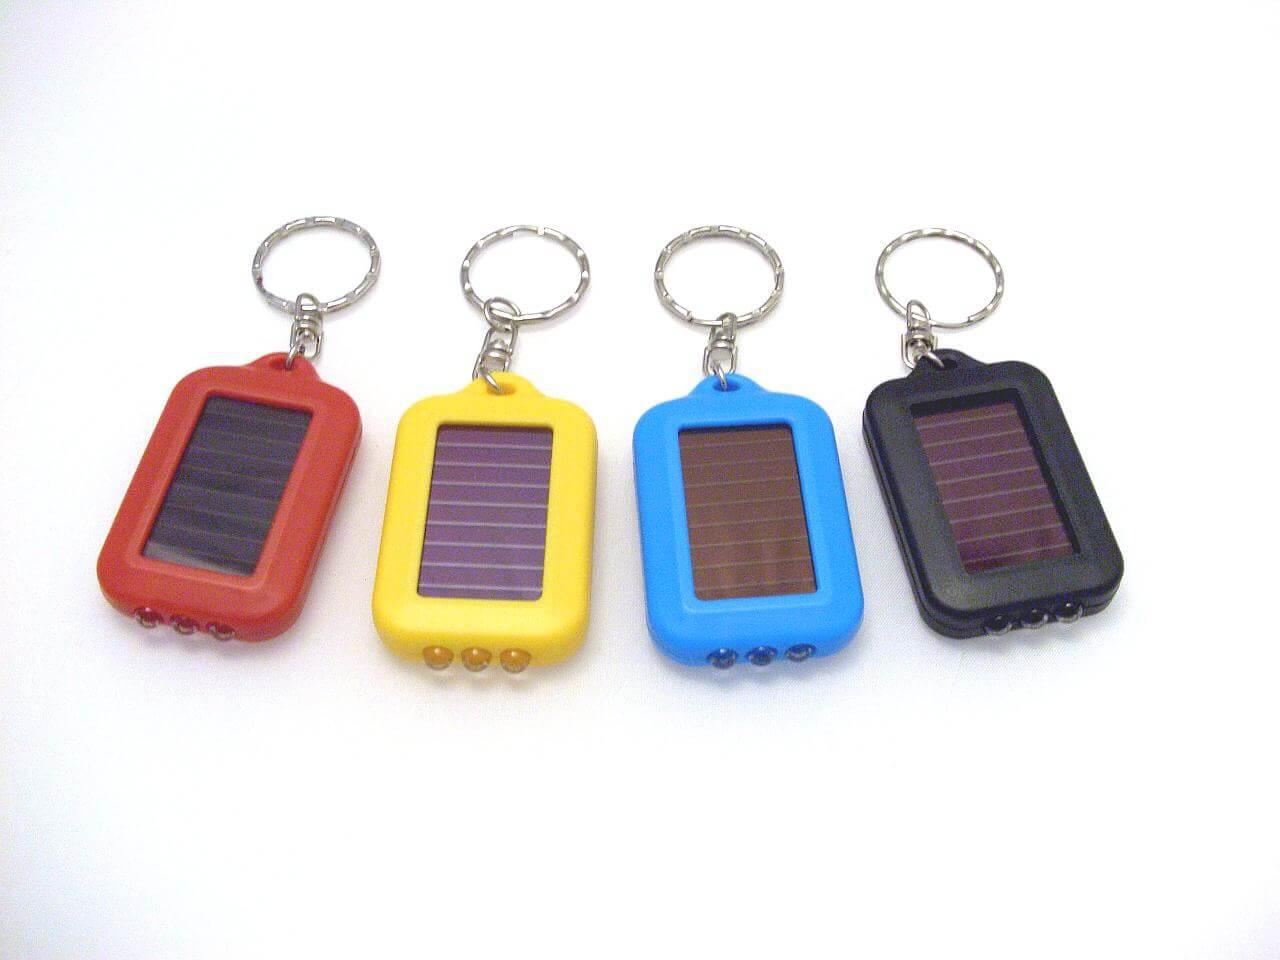 Solar-powered battery keychain